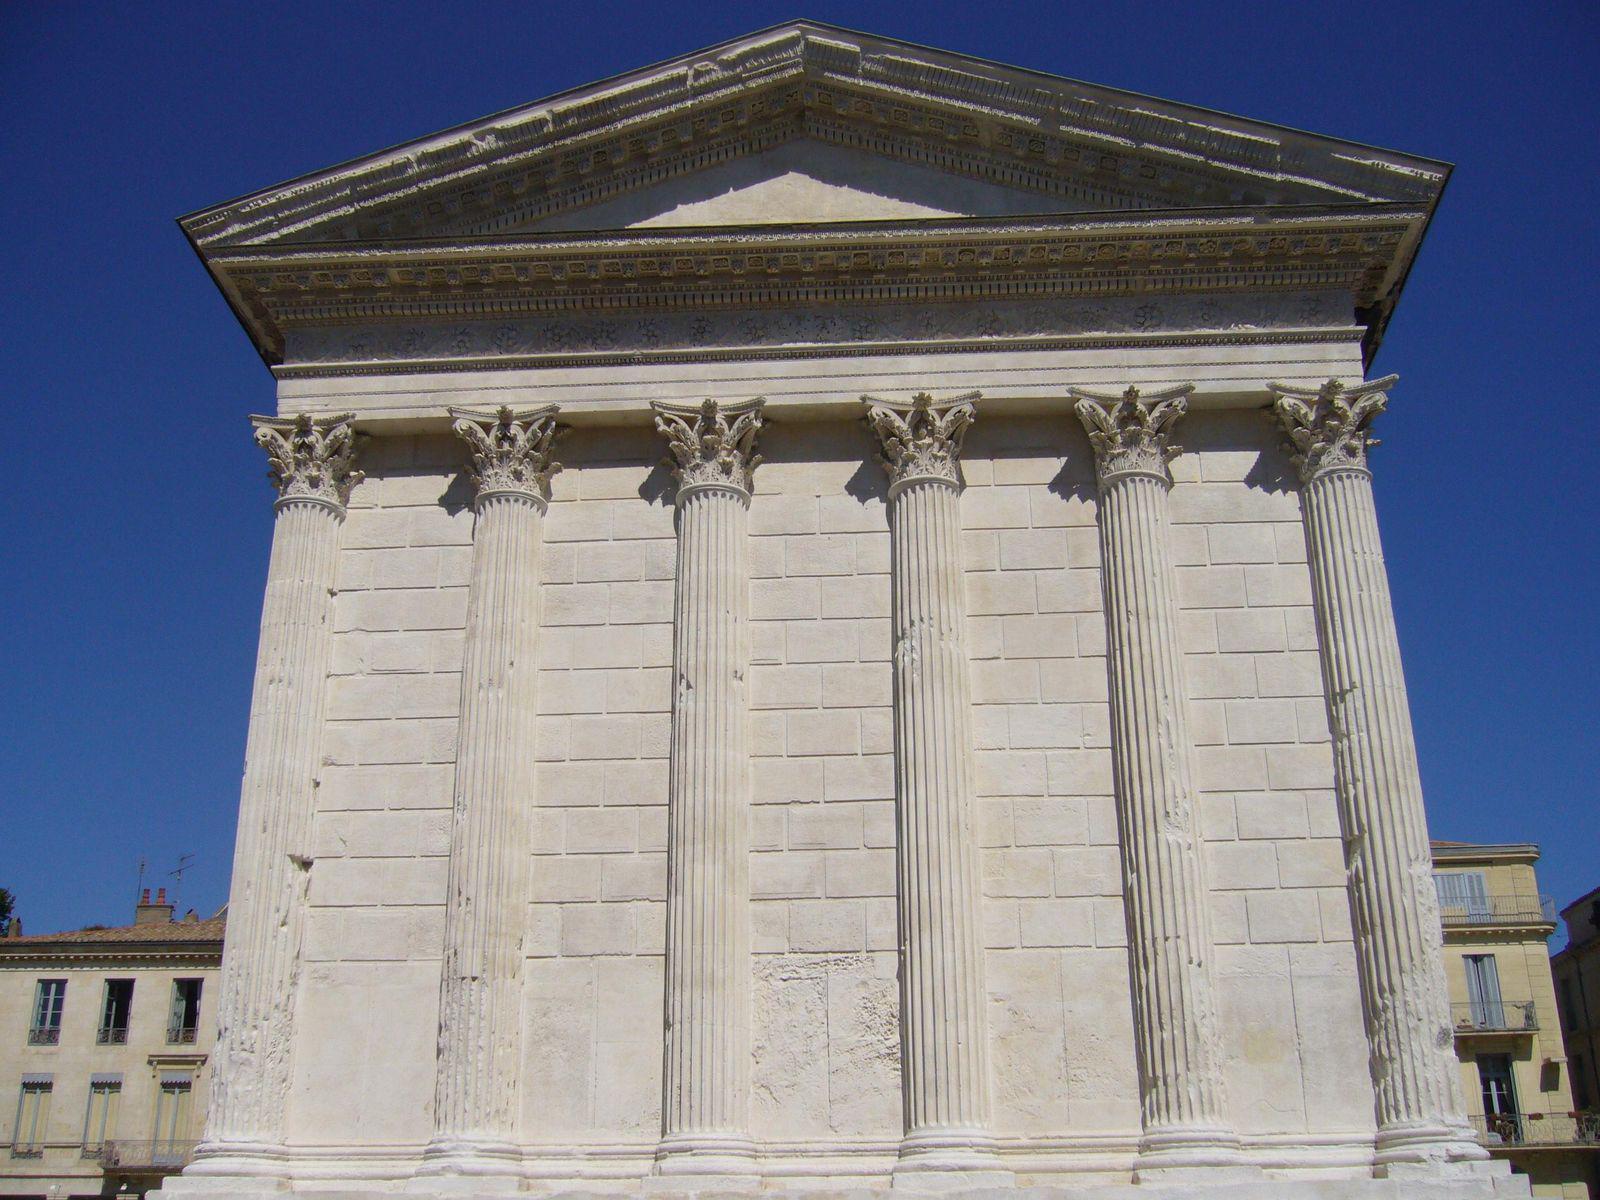 Maison CARRÉE_Nîmes